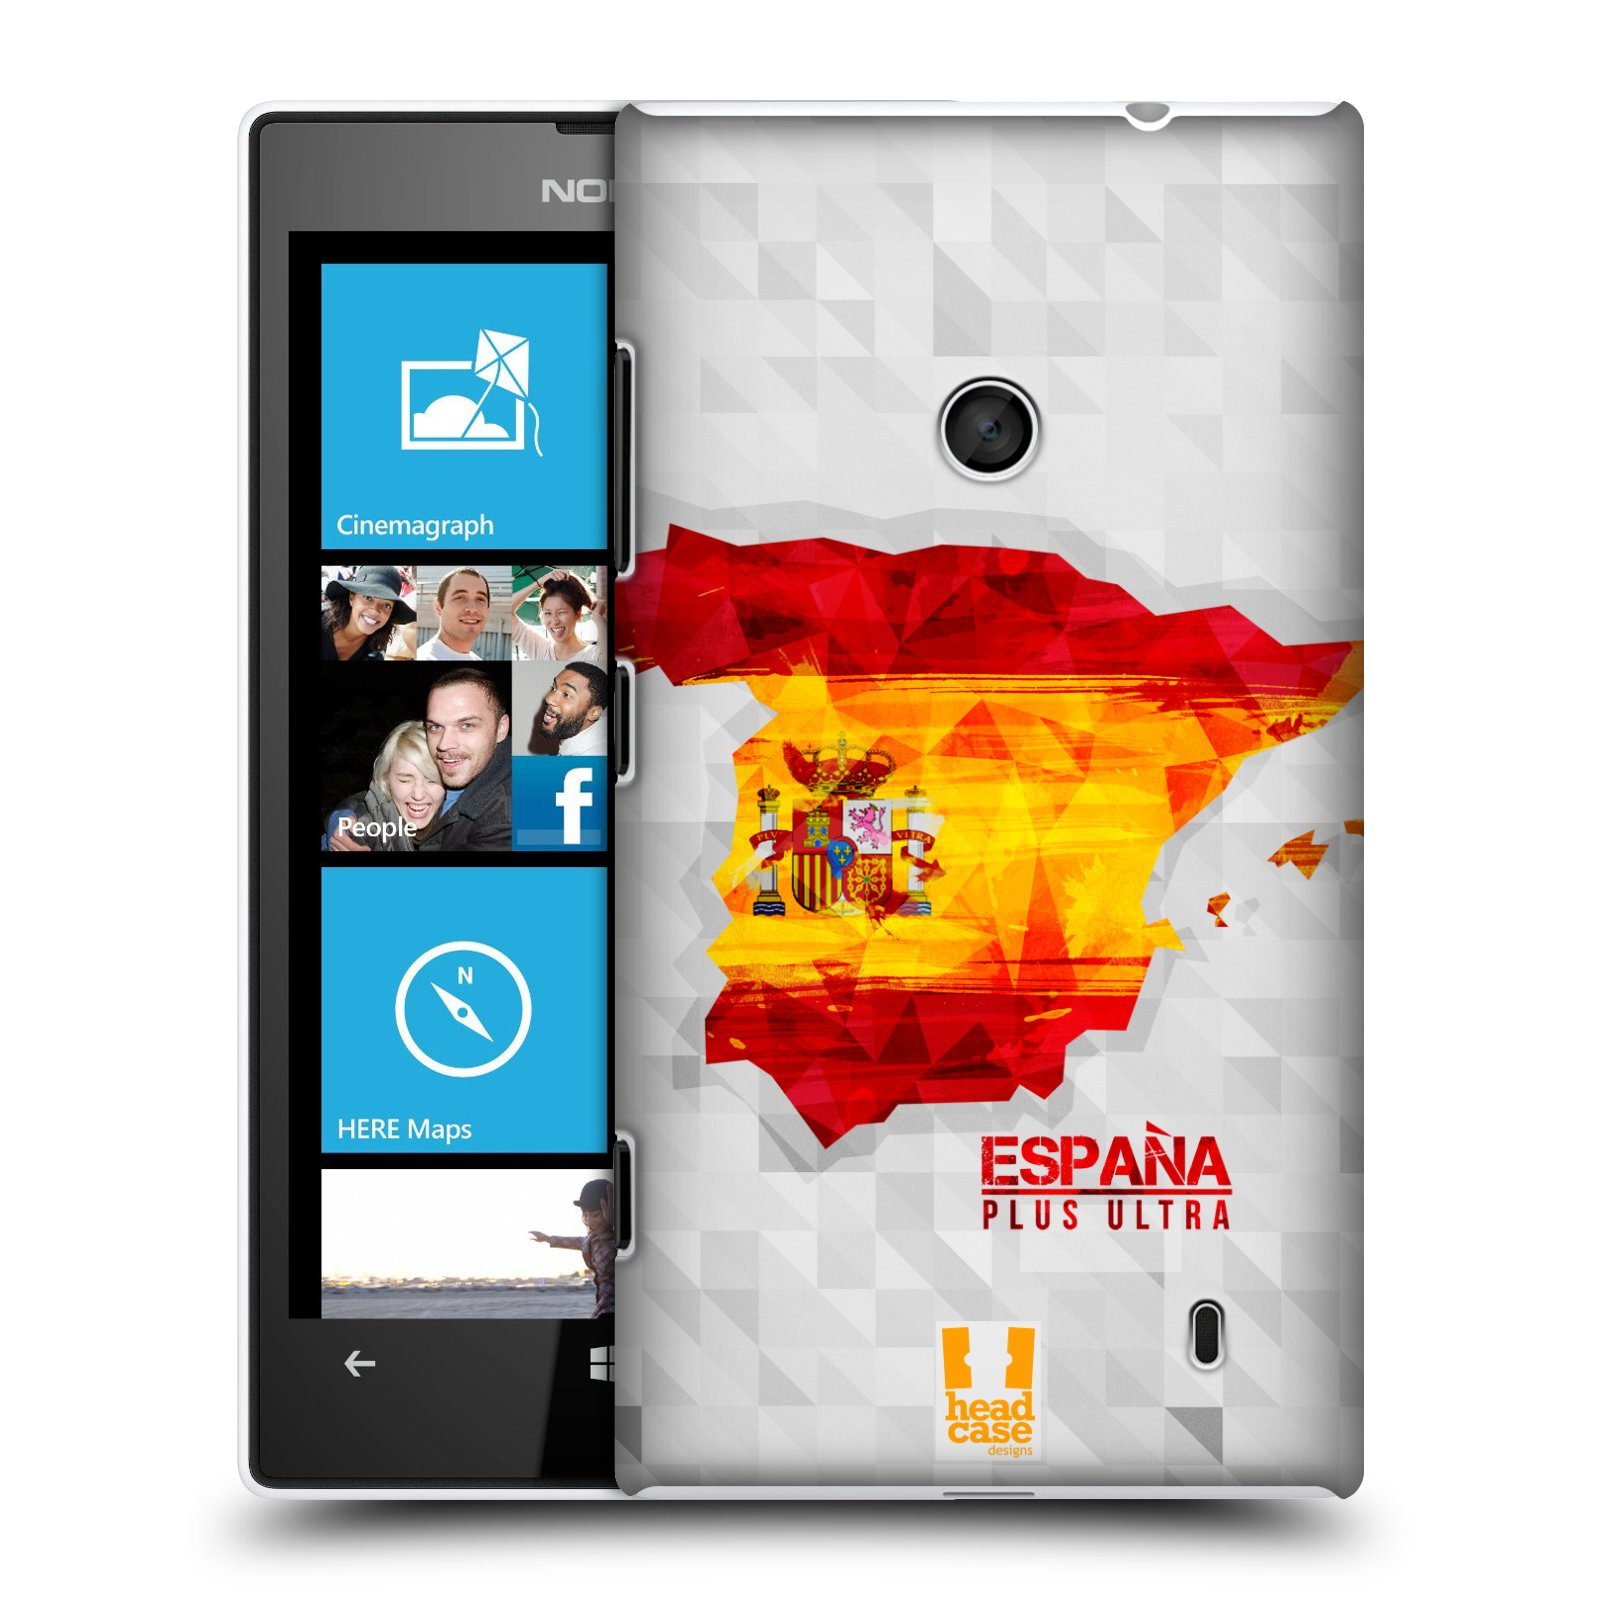 Plastové pouzdro na mobil Nokia Lumia 520 HEAD CASE GEOMAPA ŠPANĚLSKO (Kryt či obal na mobilní telefon Nokia Lumia 520 )